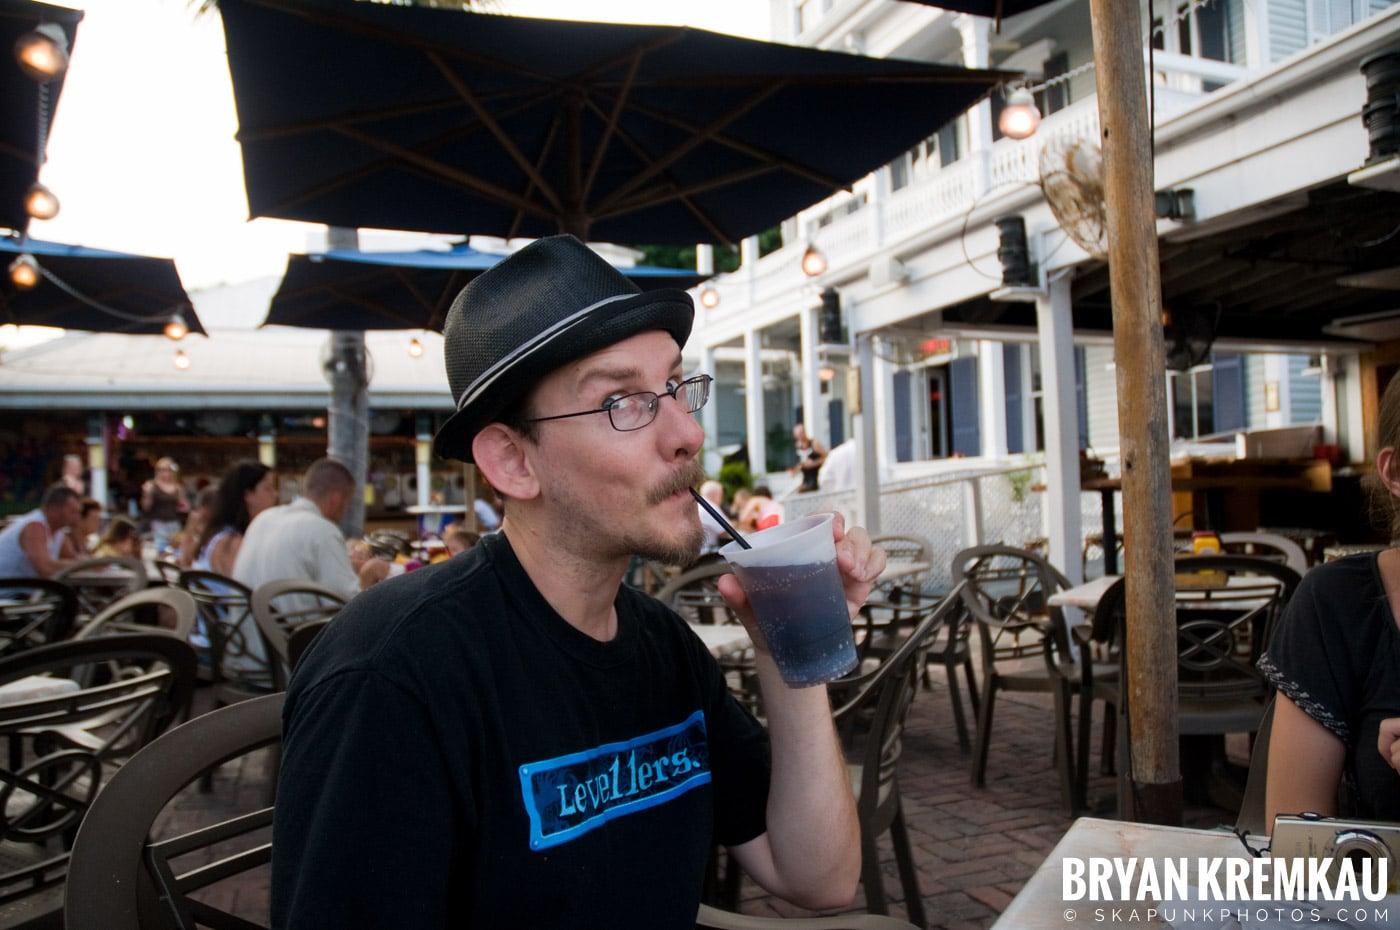 Florida Keys Vacation - 7.09.10 - 7.15.10 (3)